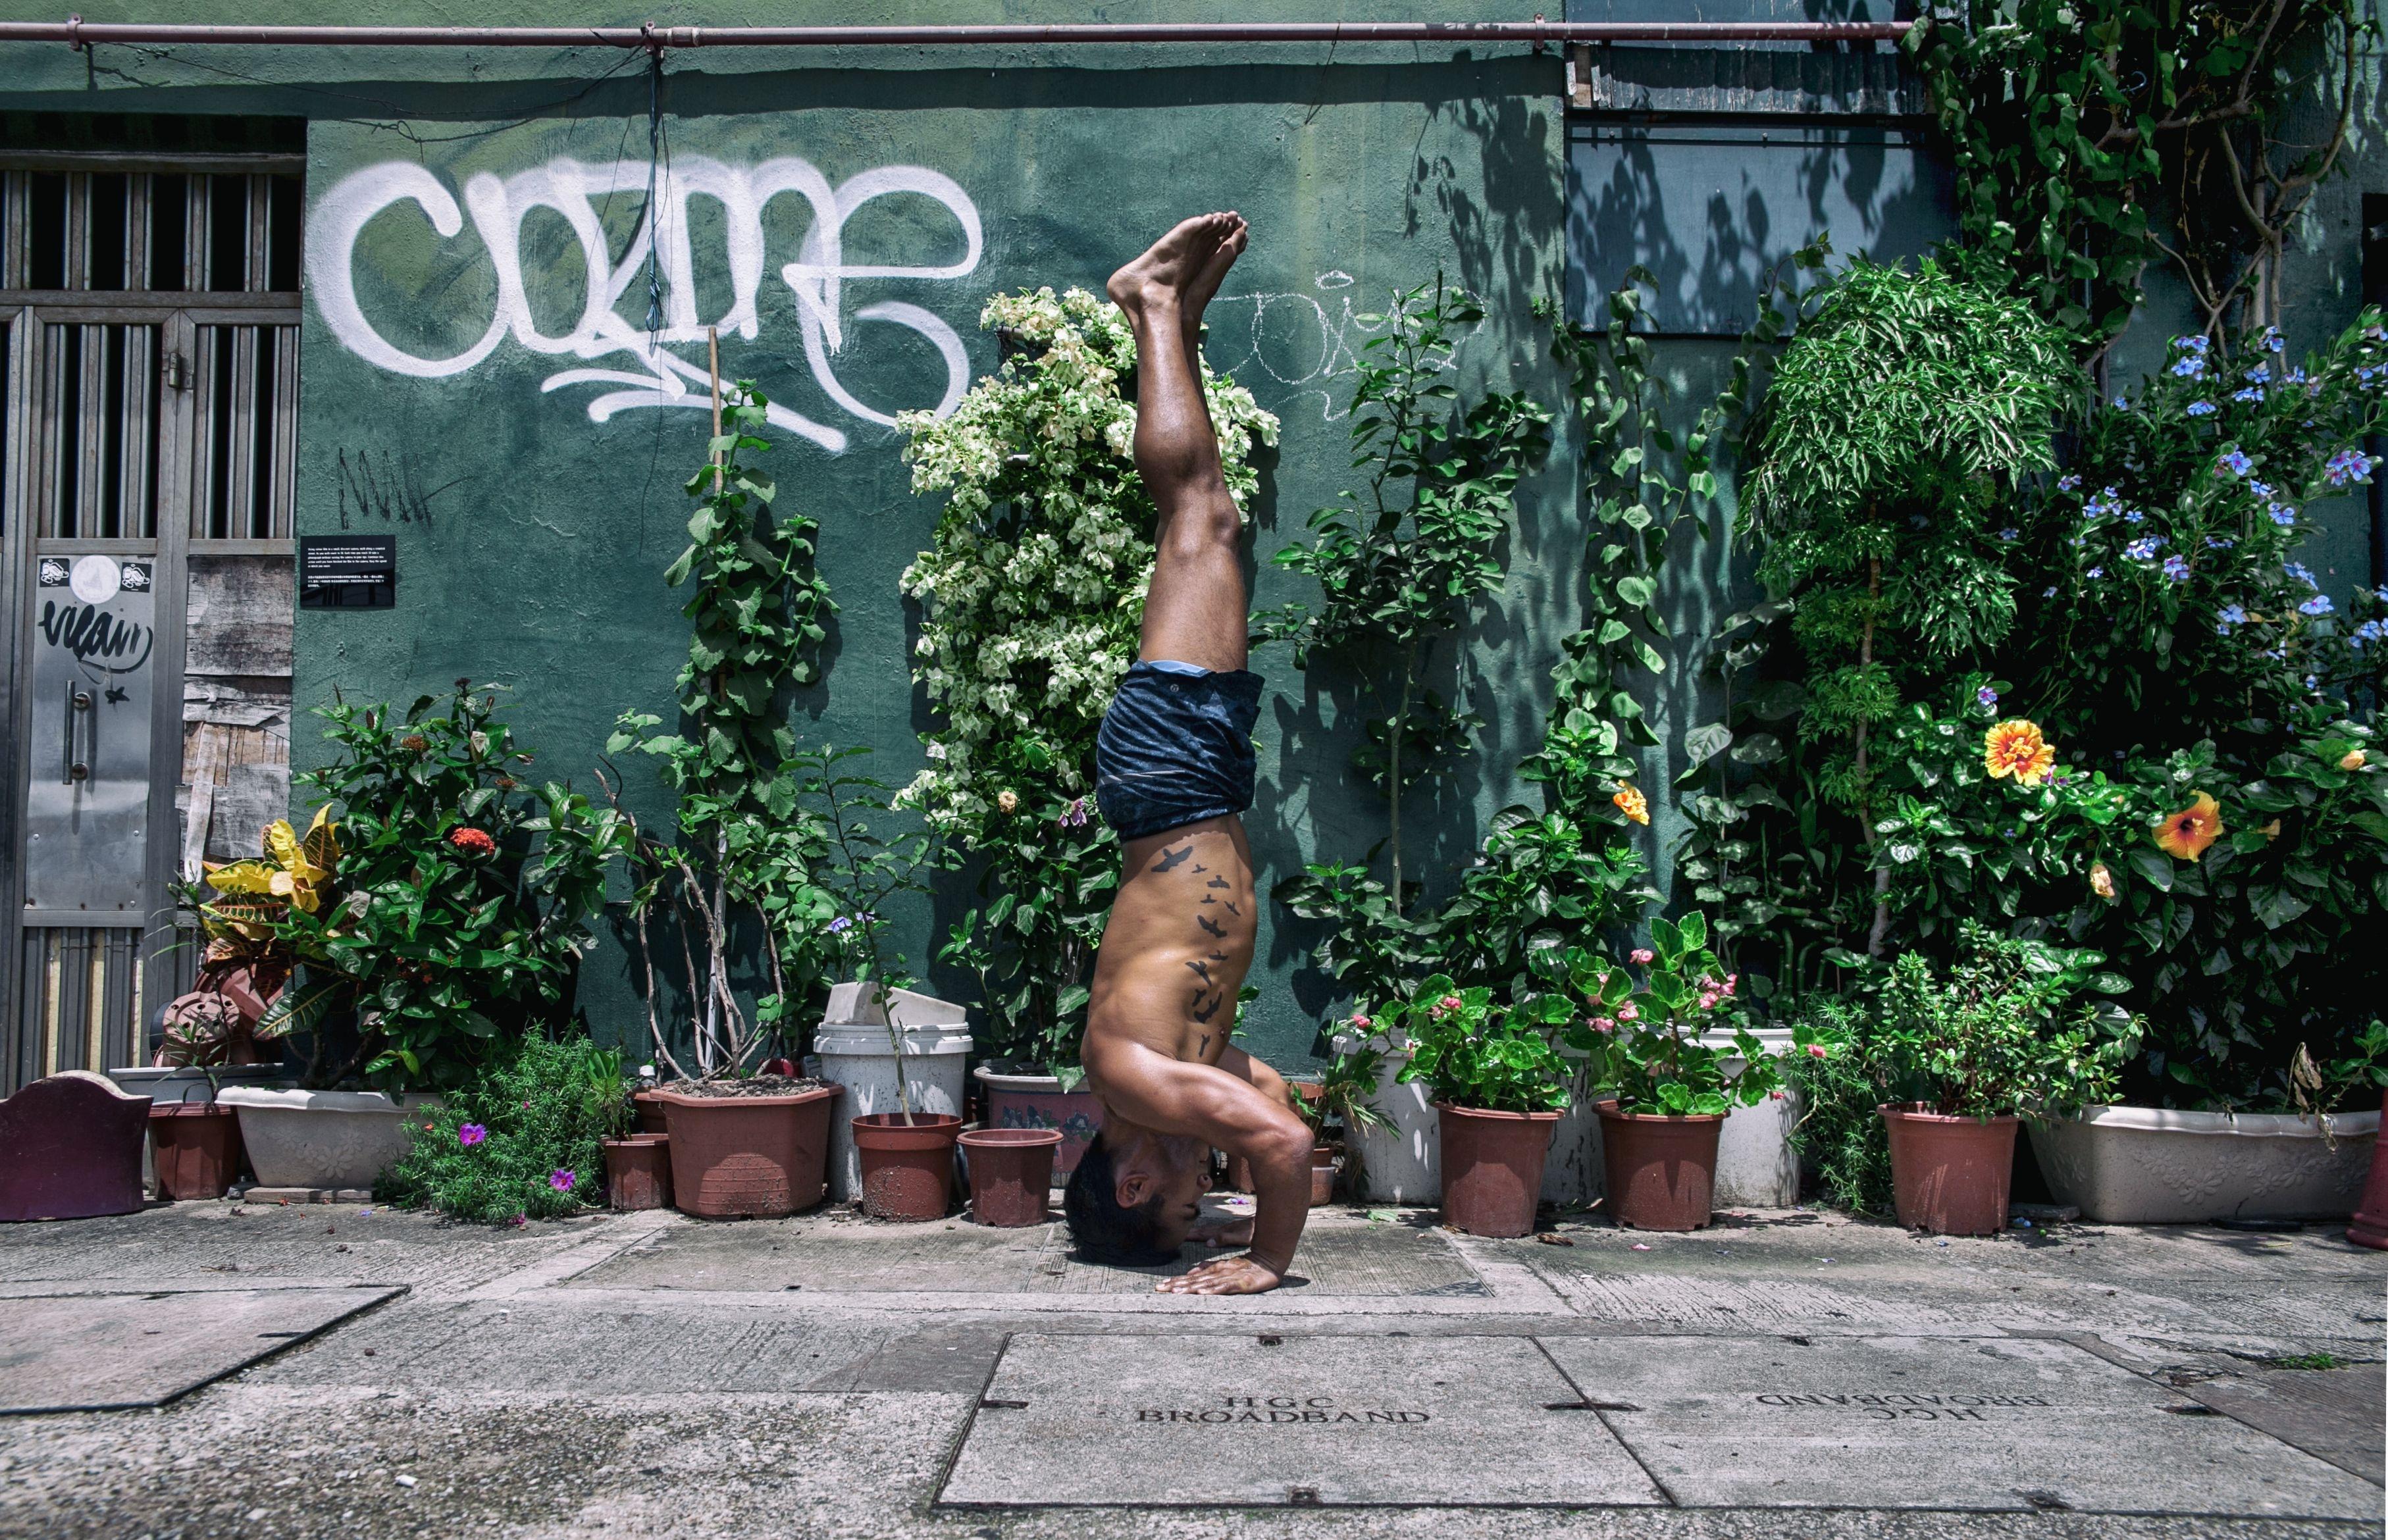 man doing upside down exercise